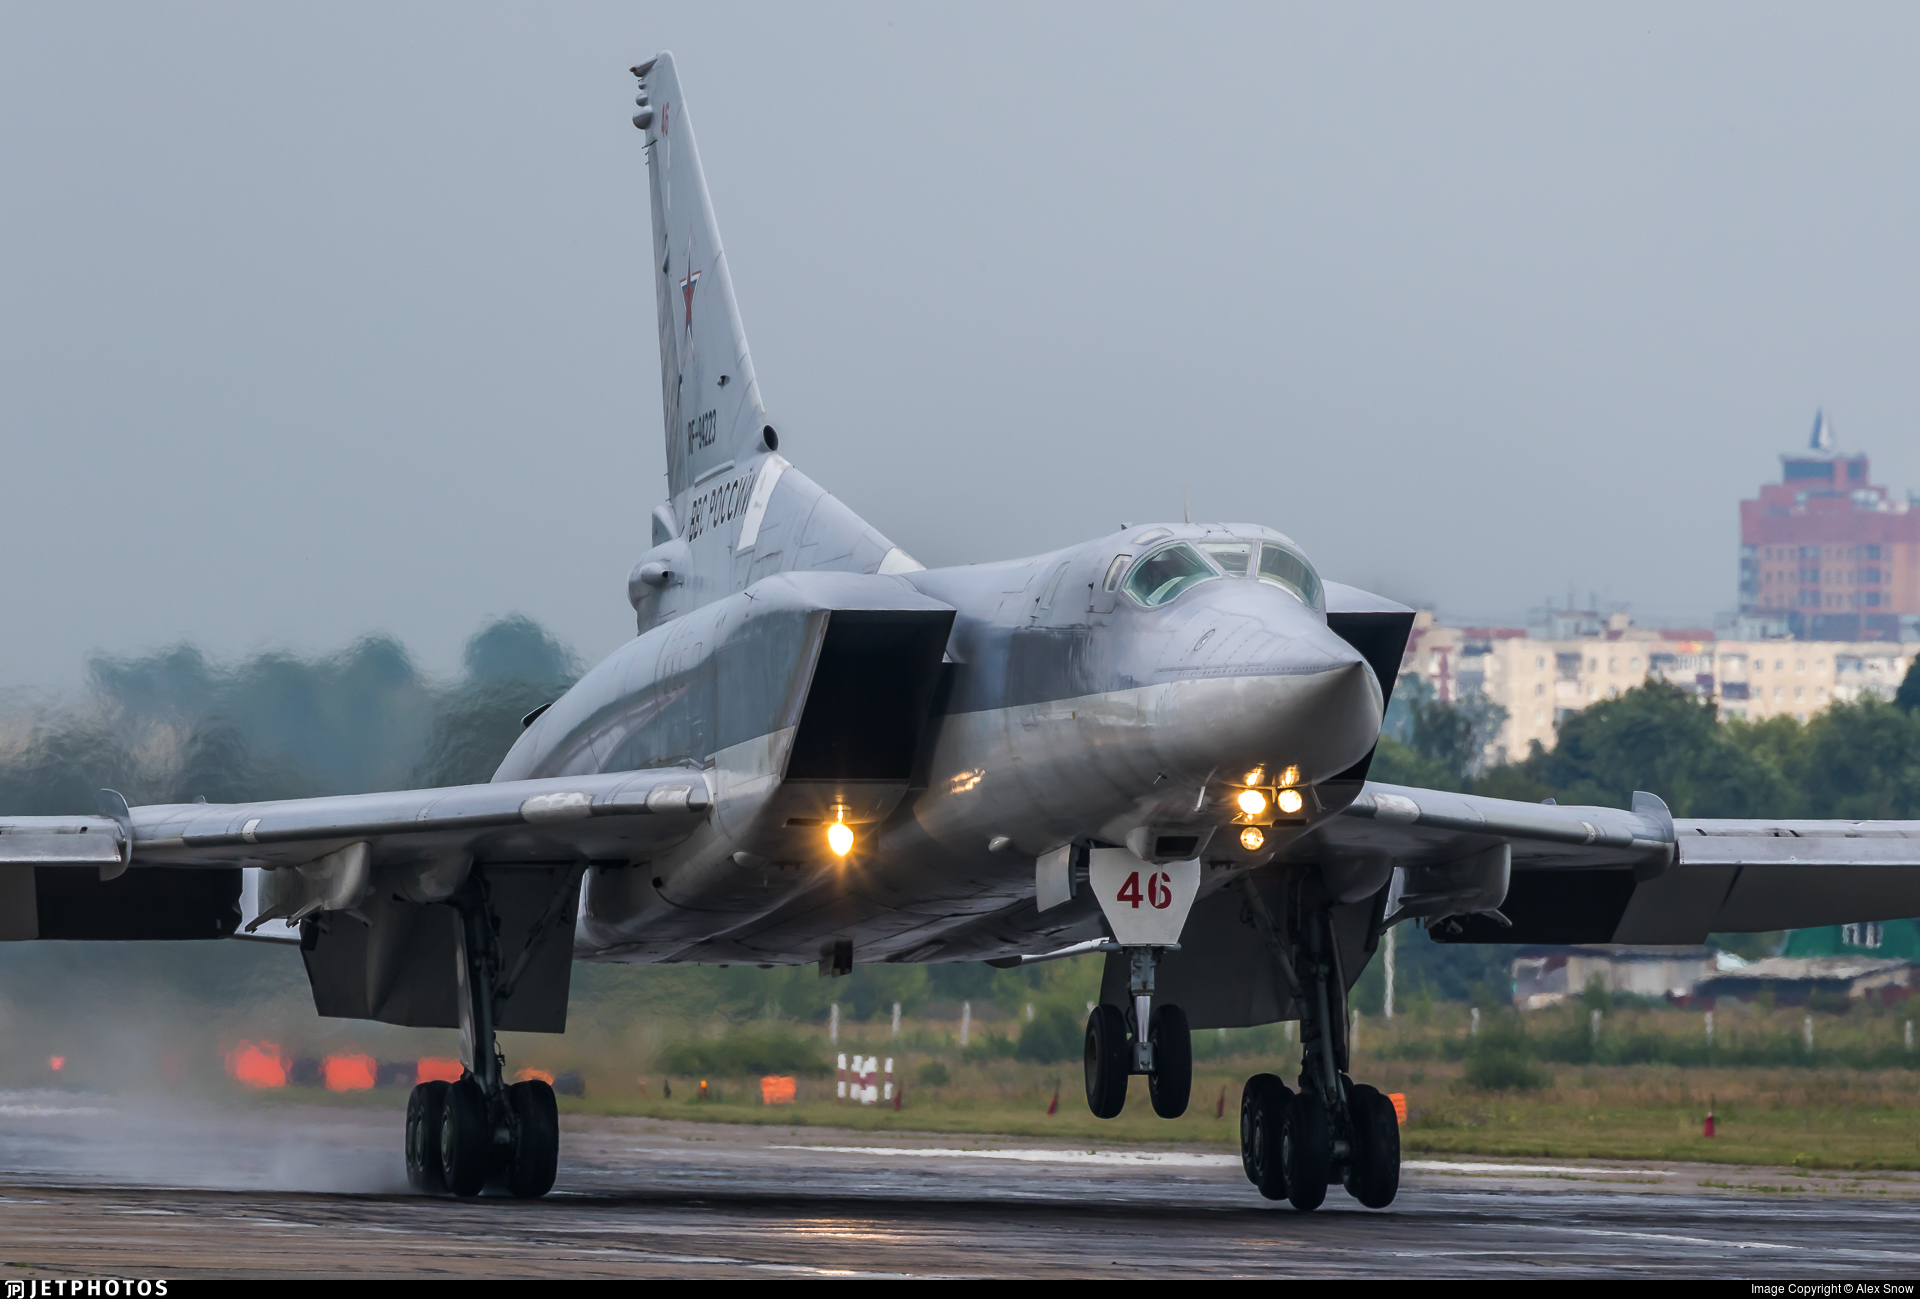 RF-94223 - Tupolev Tu-22M3 Backfire - Russia - Air Force